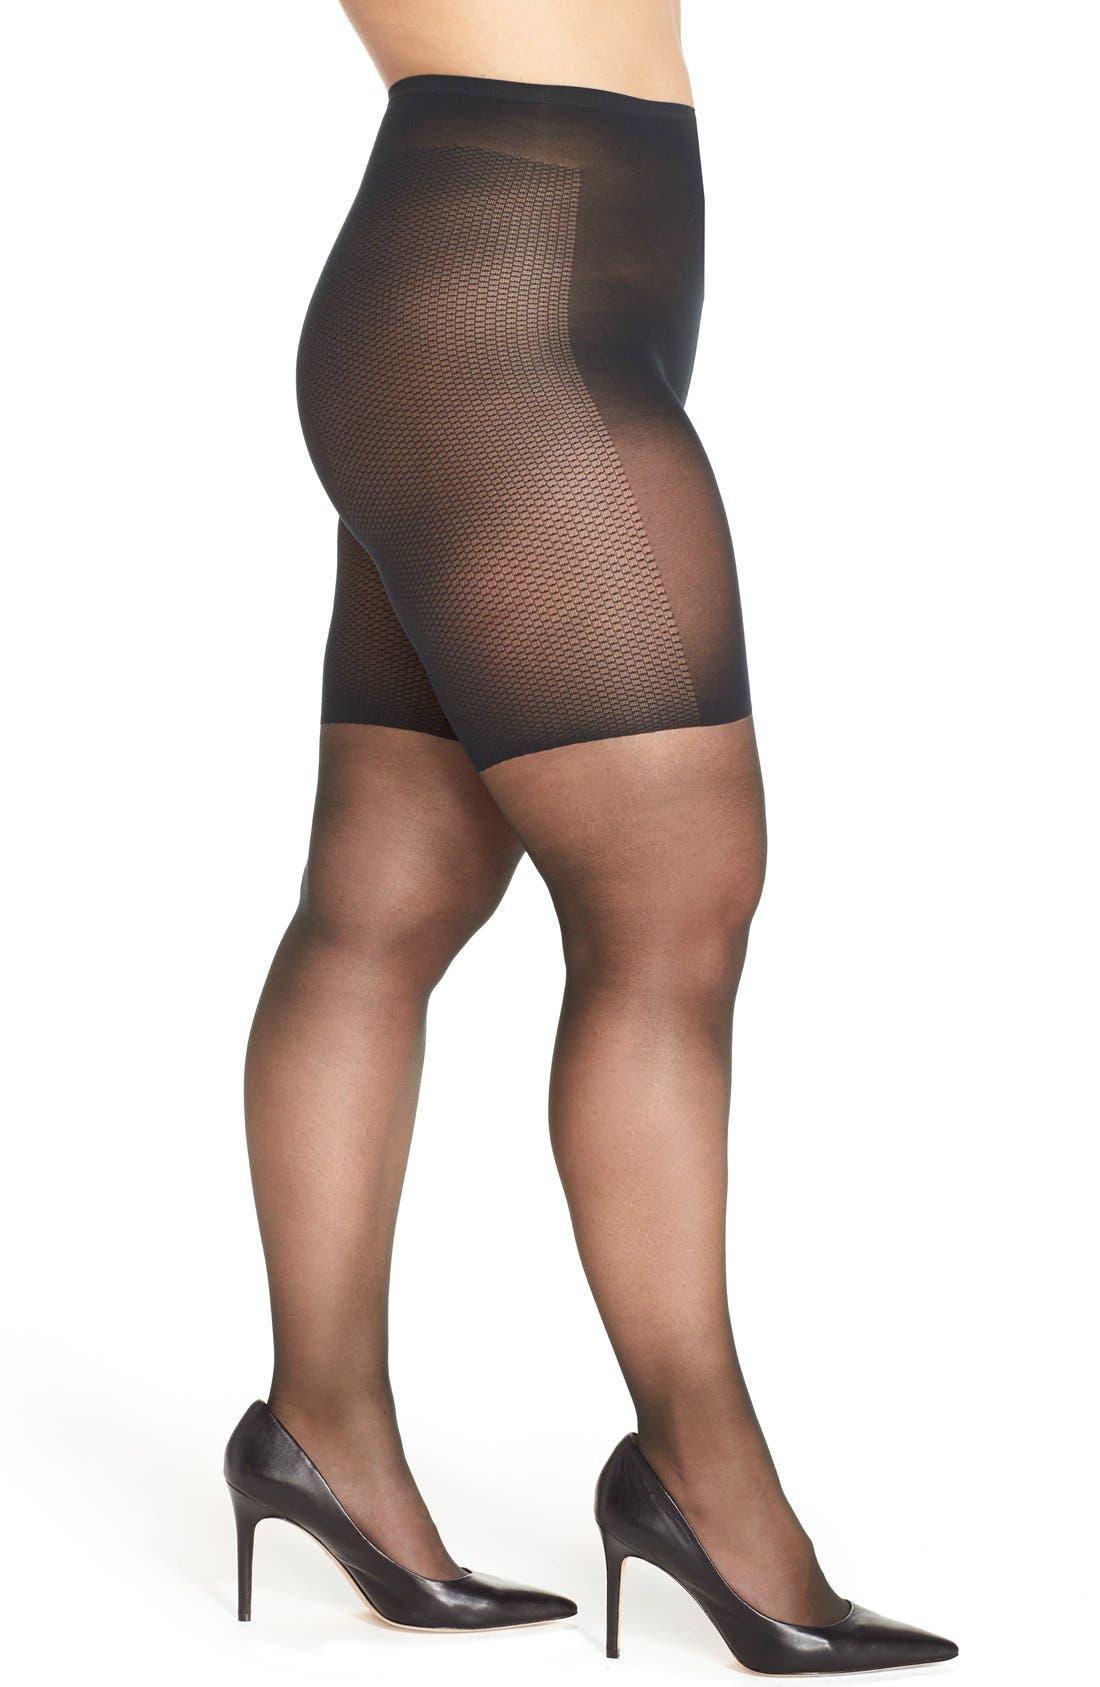 Light Control Top Pantyhose,                         Main,                         color, Fantasy Black